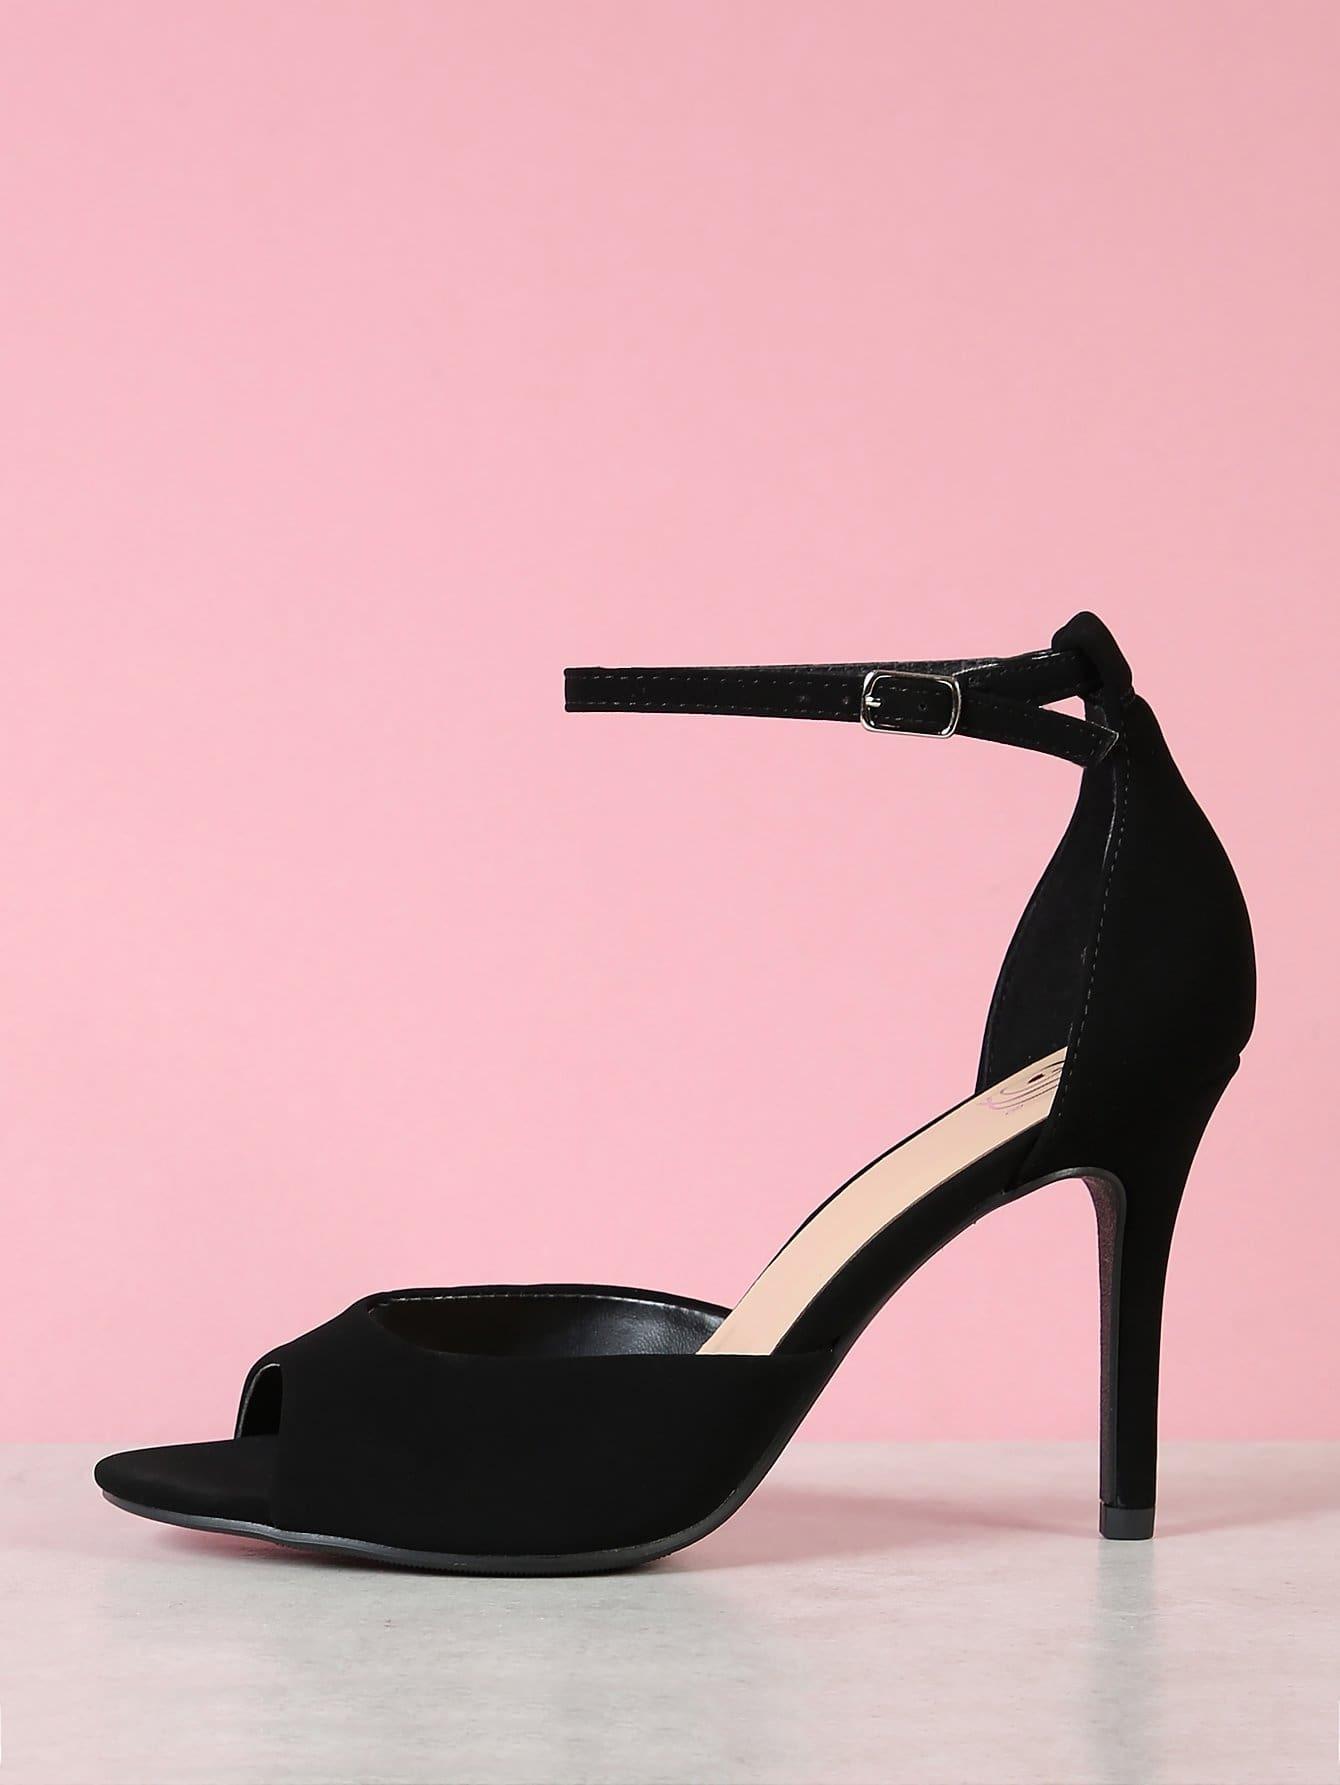 Nubuck Peep Toe Ankle Strap High Heels mix color causal wedge high heels women sandals platform ladies shoes open toe ankle strap womens heels size 11 women heels